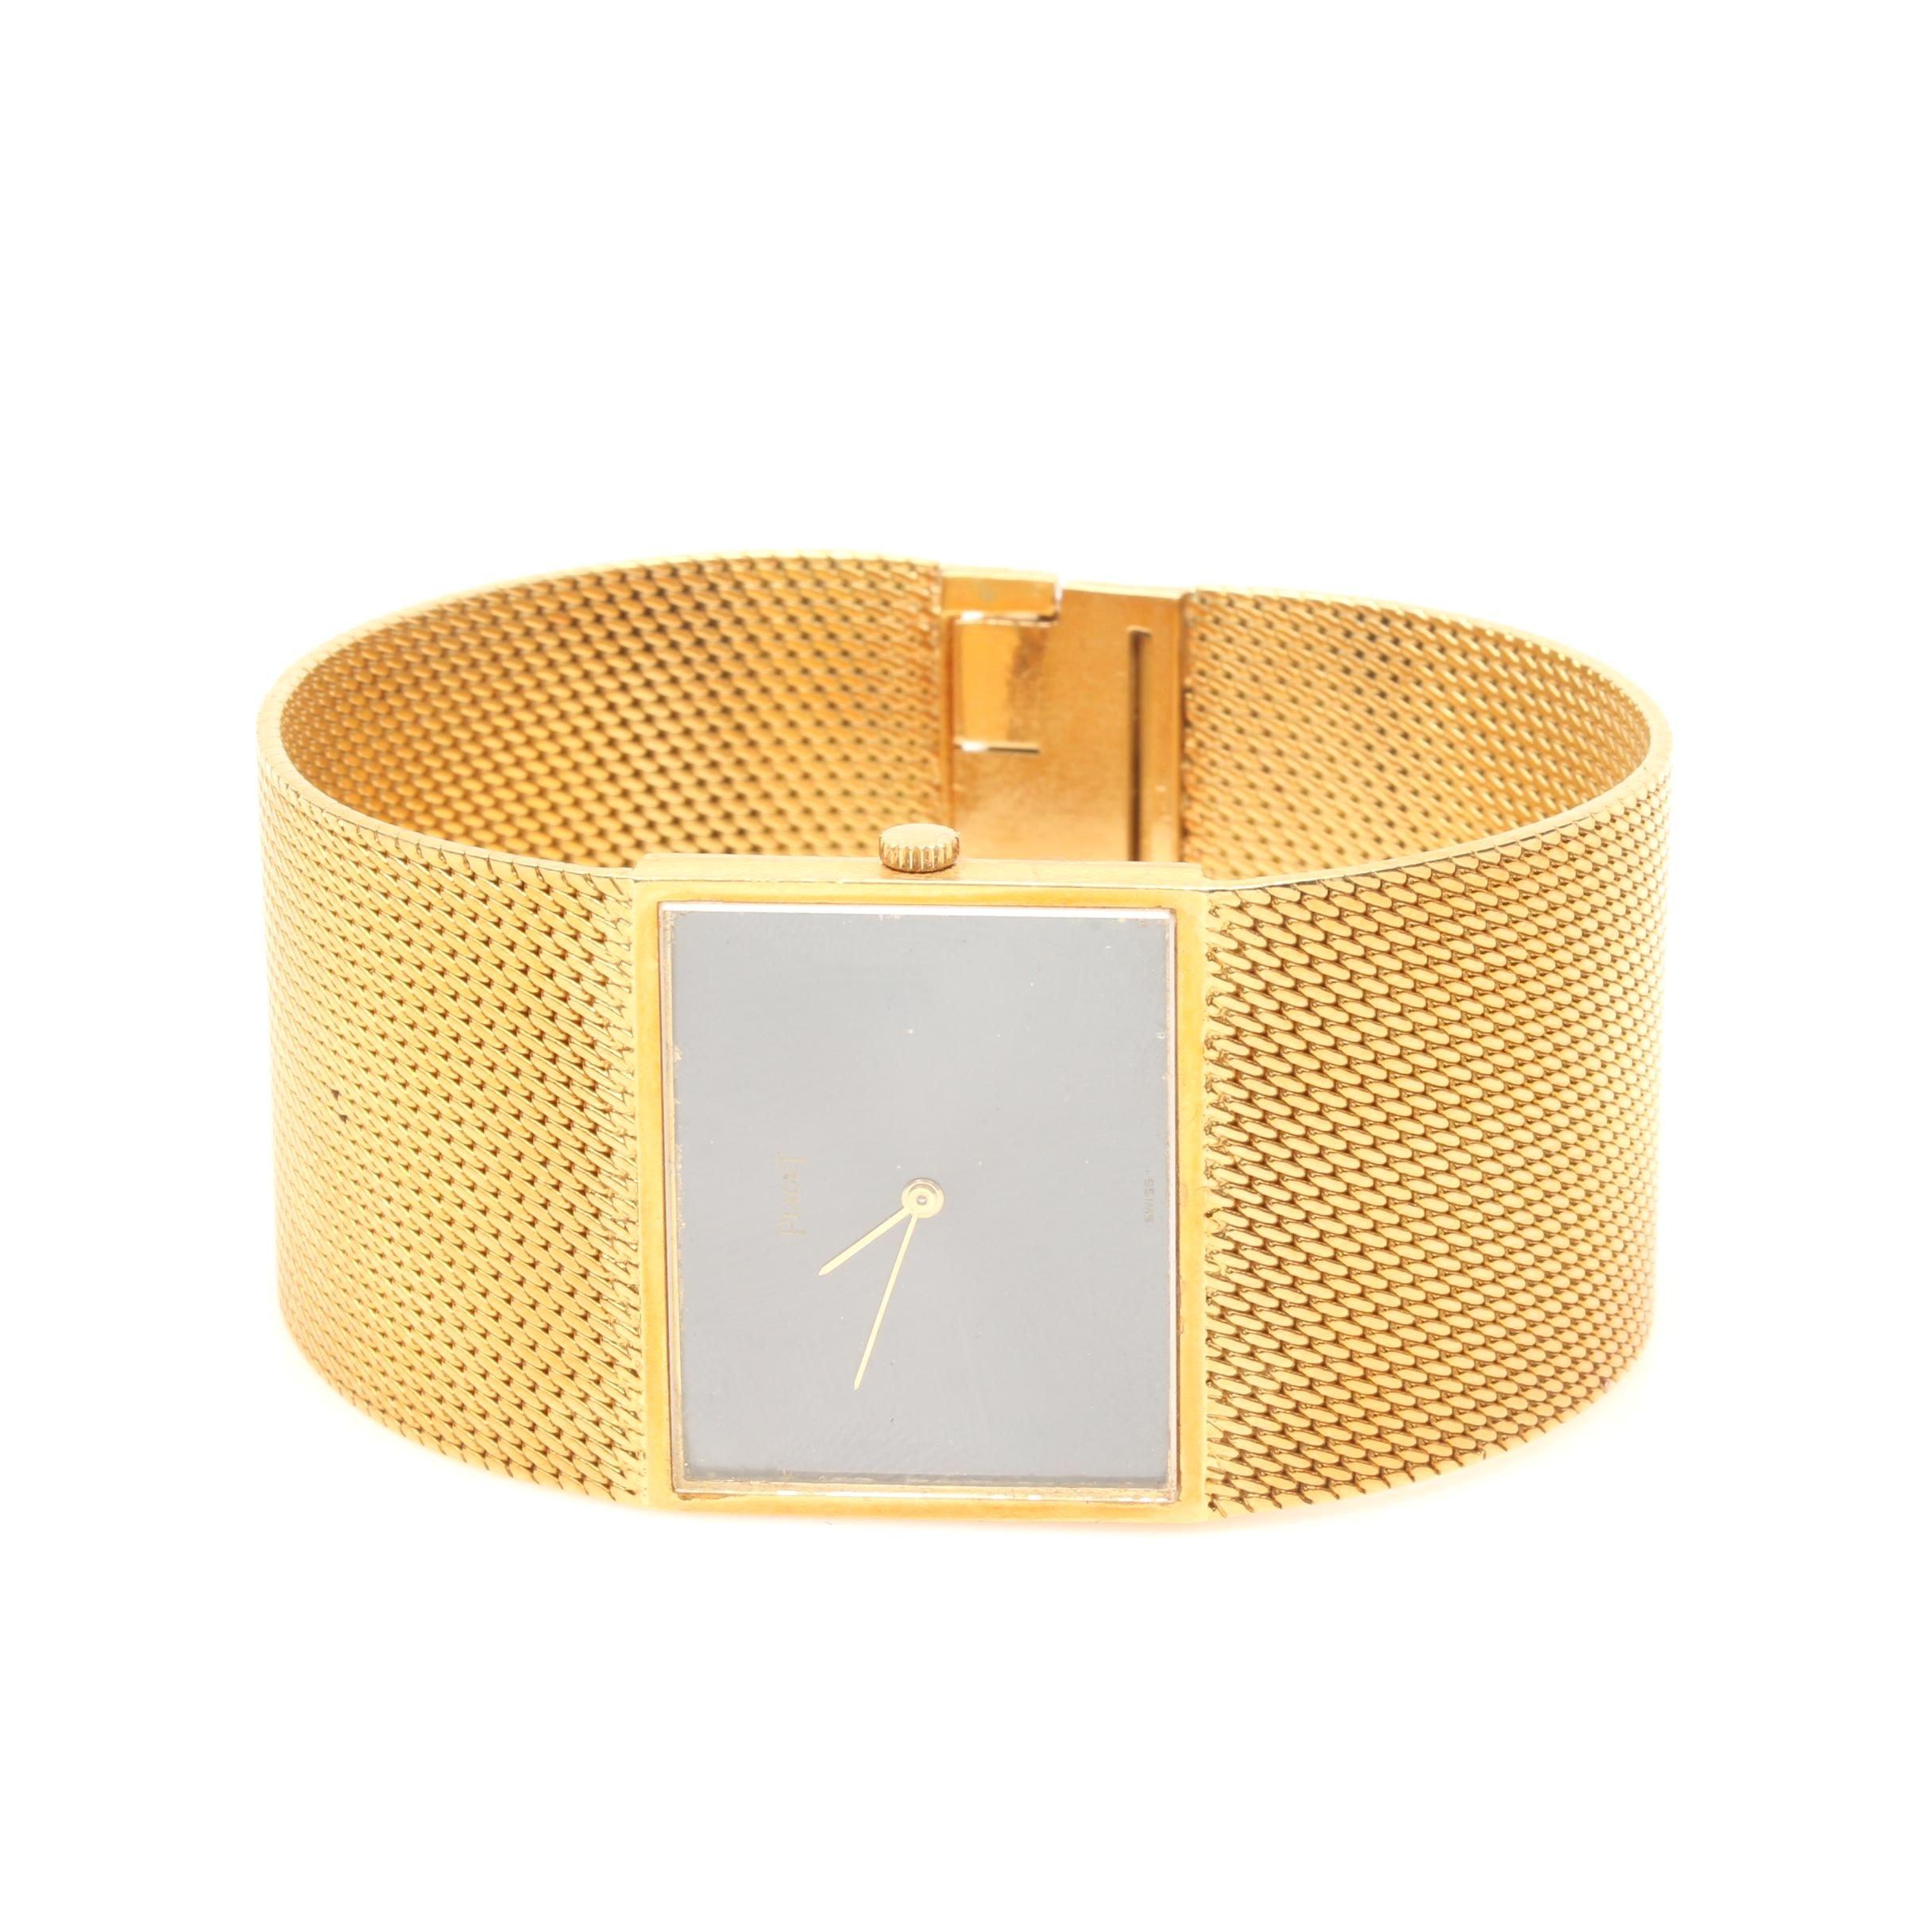 18K Yellow Gold Piaget Wristwatch